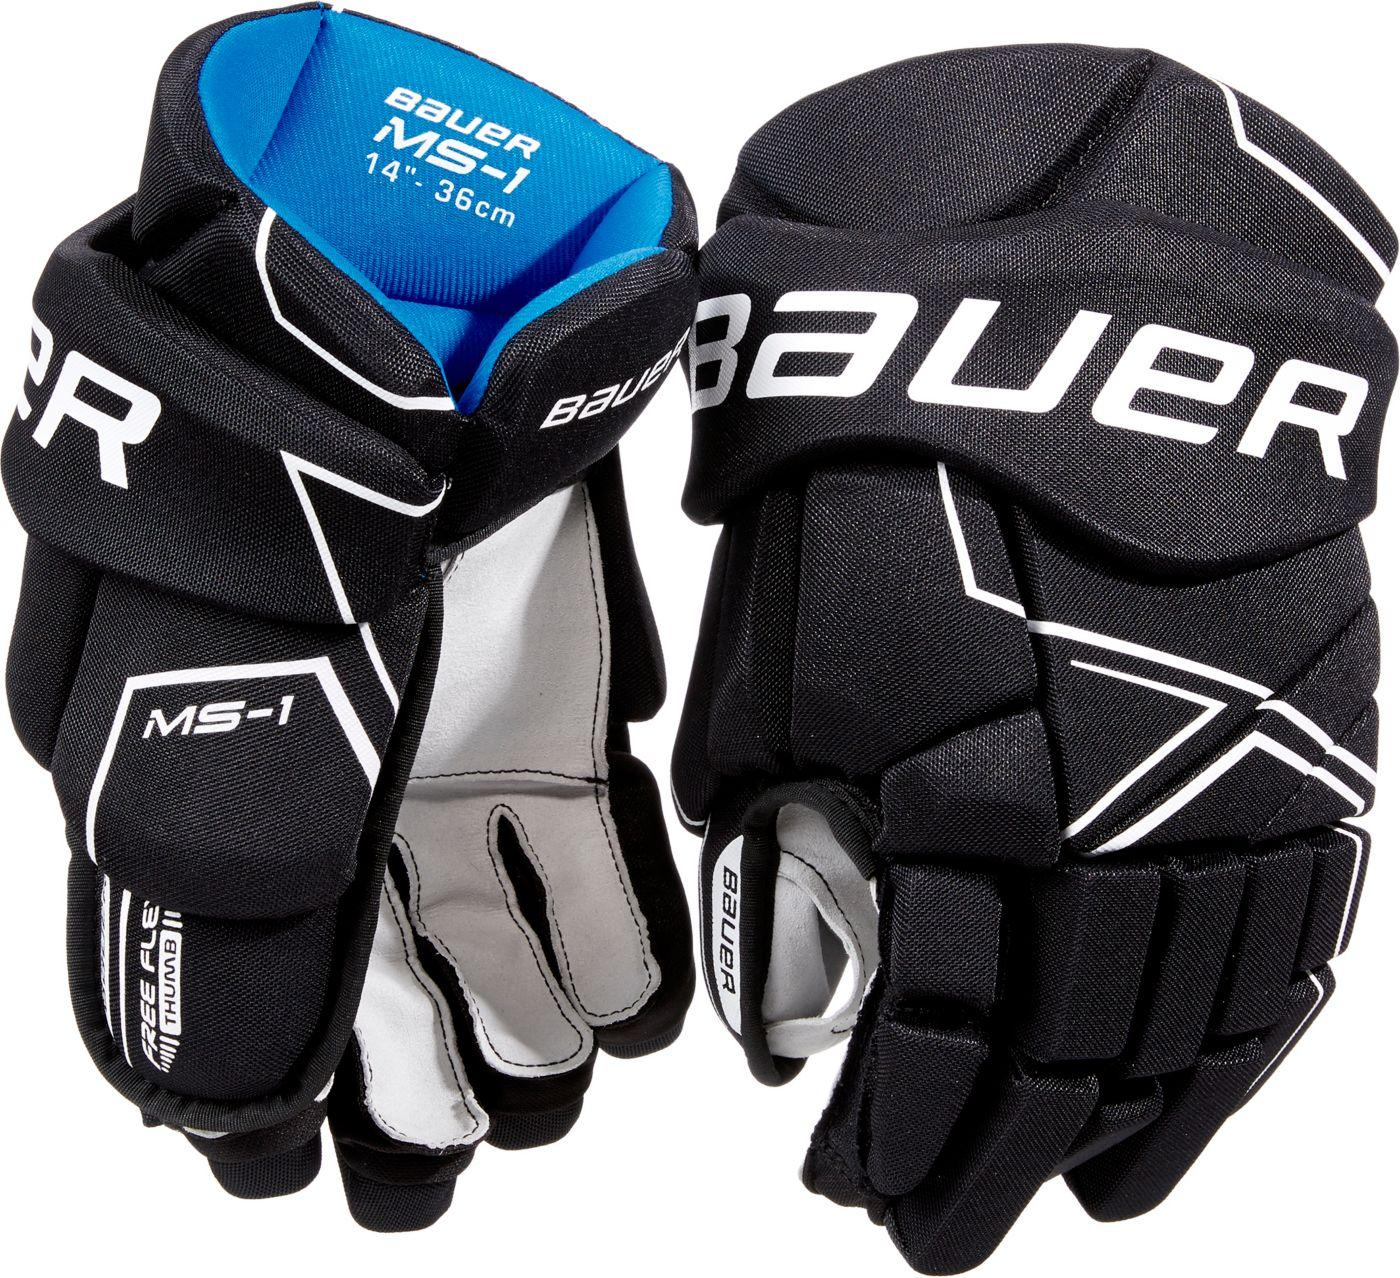 Bauer Senior MS1 Ice Hockey Gloves